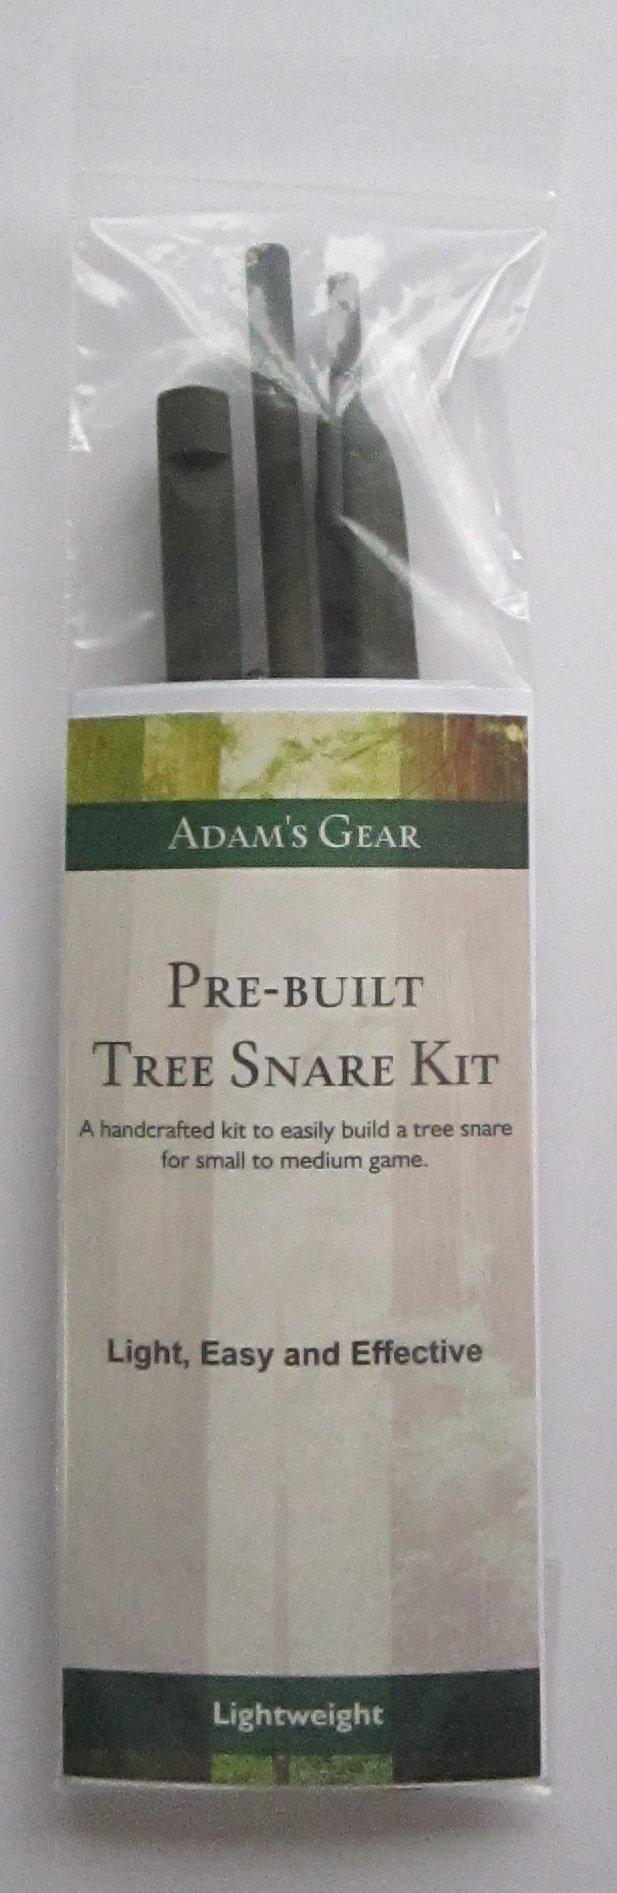 Adam's Outdoor Gear Lightweight Survival Tree Spring Trap Snare Kit 2.0, Small Animal Snare, Small Animal Trap, Game Snare, Survival Snare